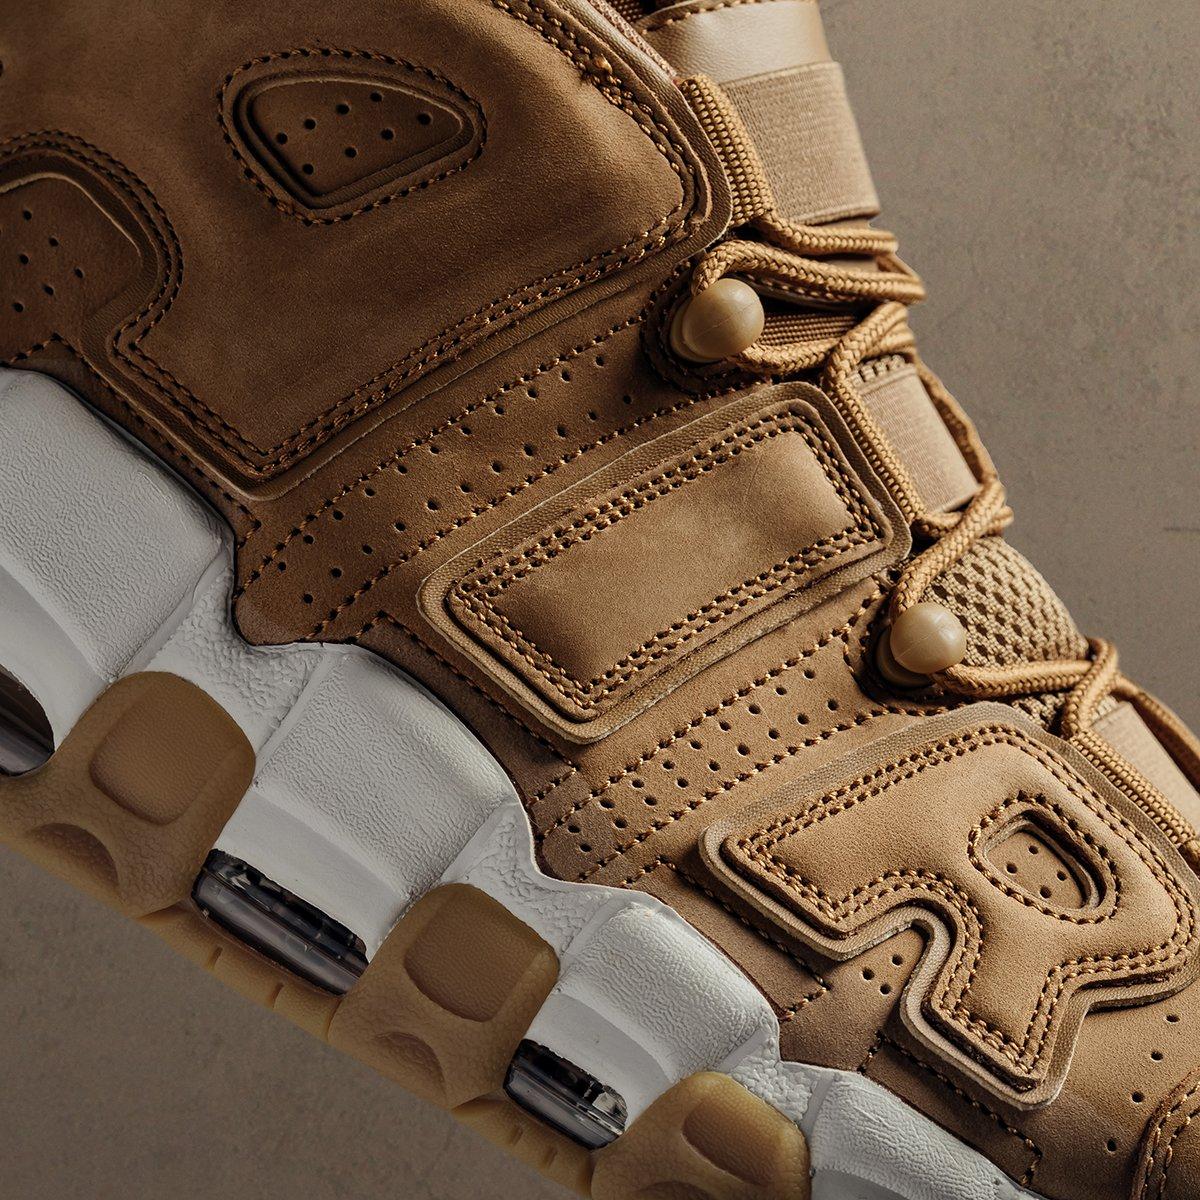 f1650afd00e Nike Total Air Foamposite Duncan Nike Total Air Foamposite Max Size ...